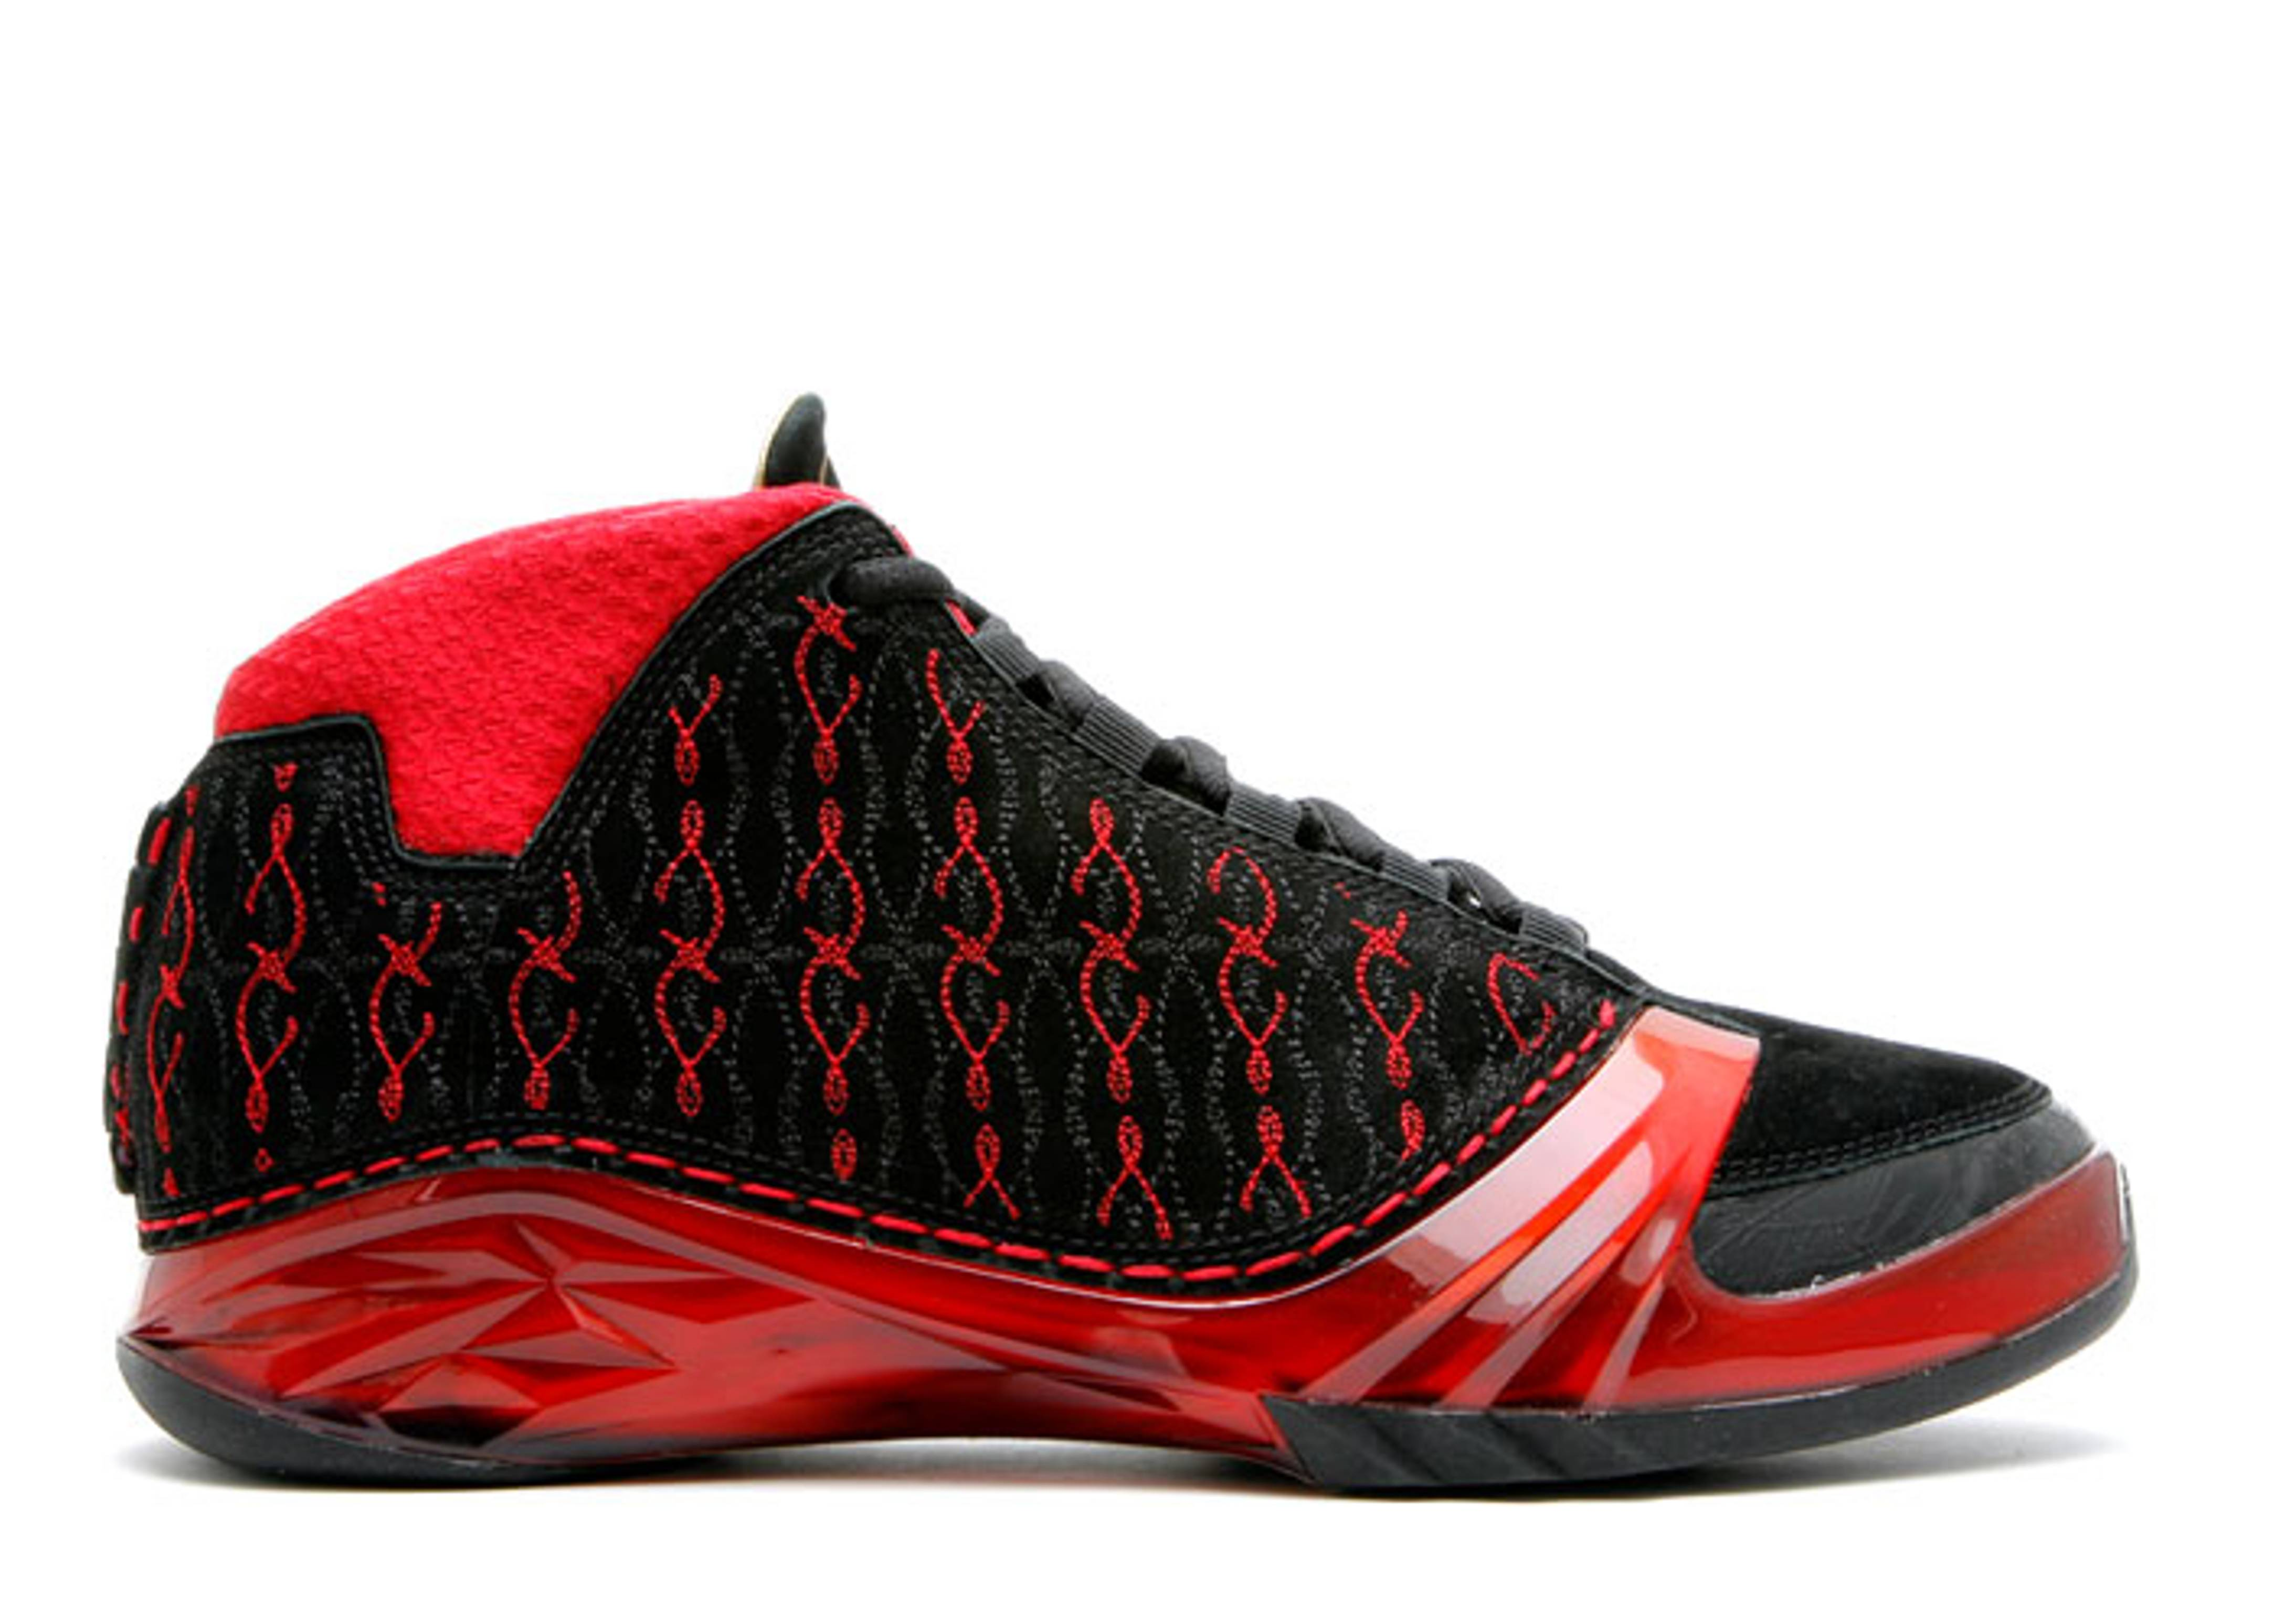 934b1d51bb6a Air Jordan 23 (XXIII) Shoes - Nike